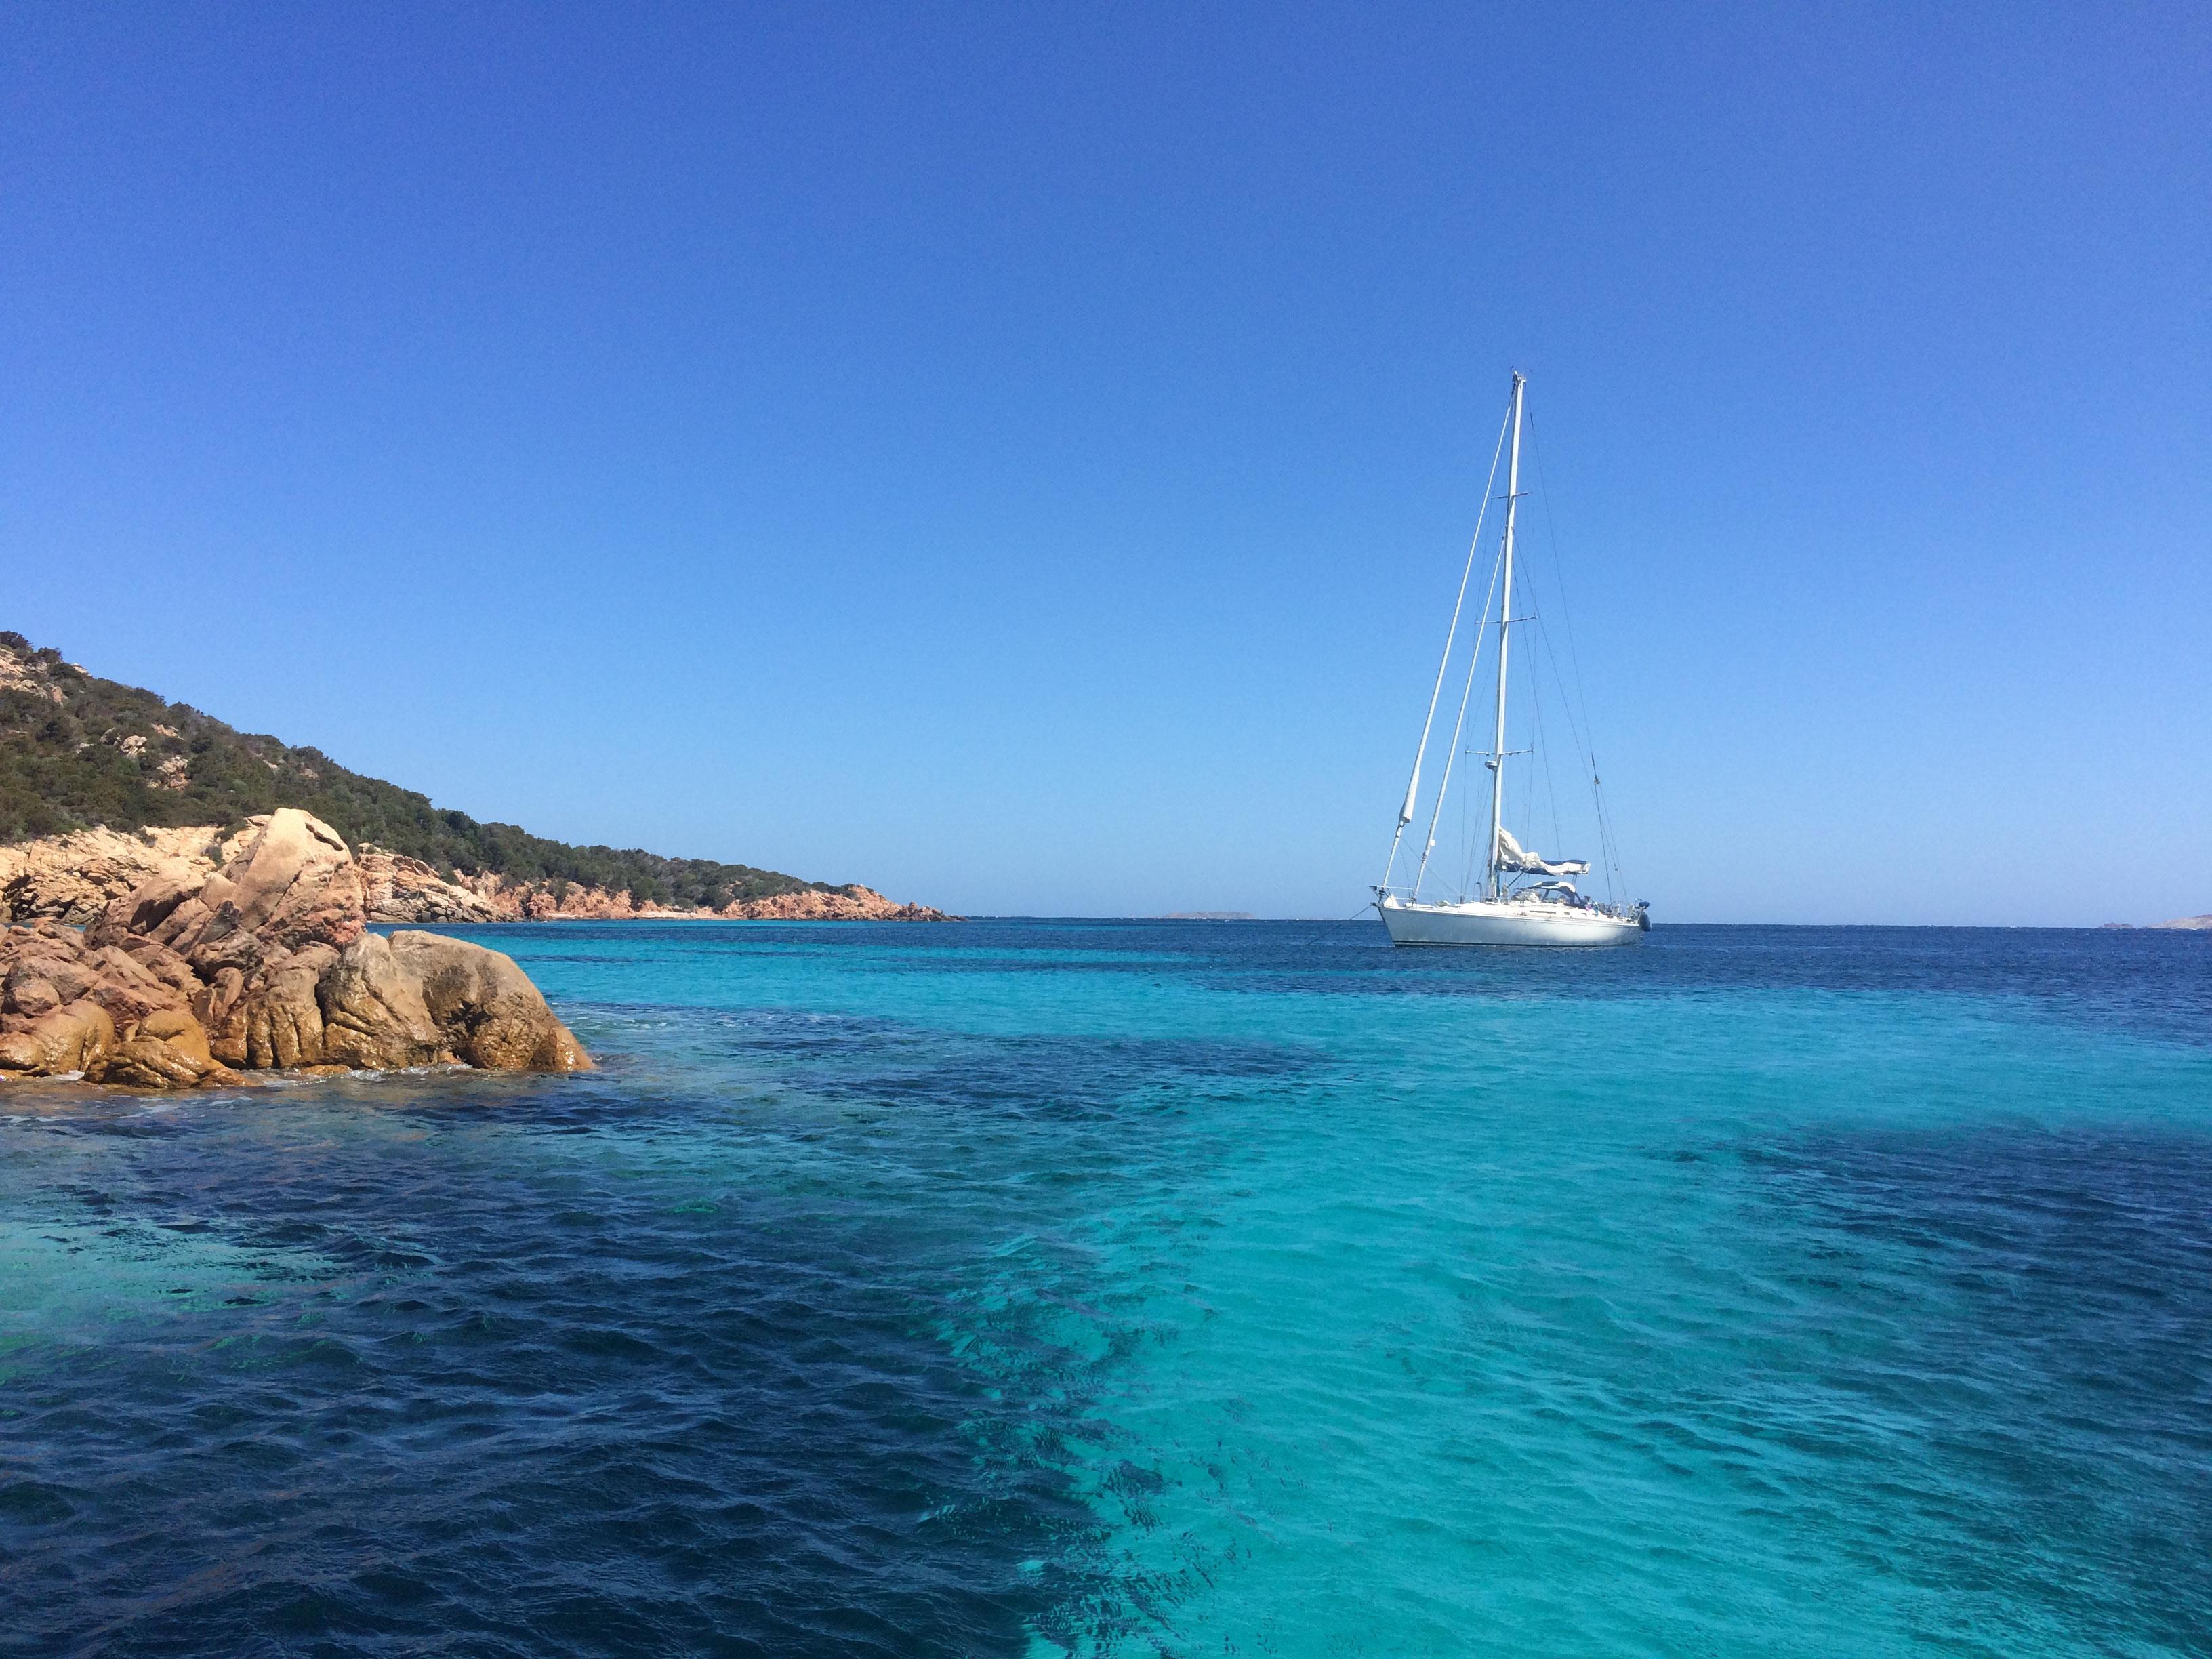 Barca a vela jep-6-first-51